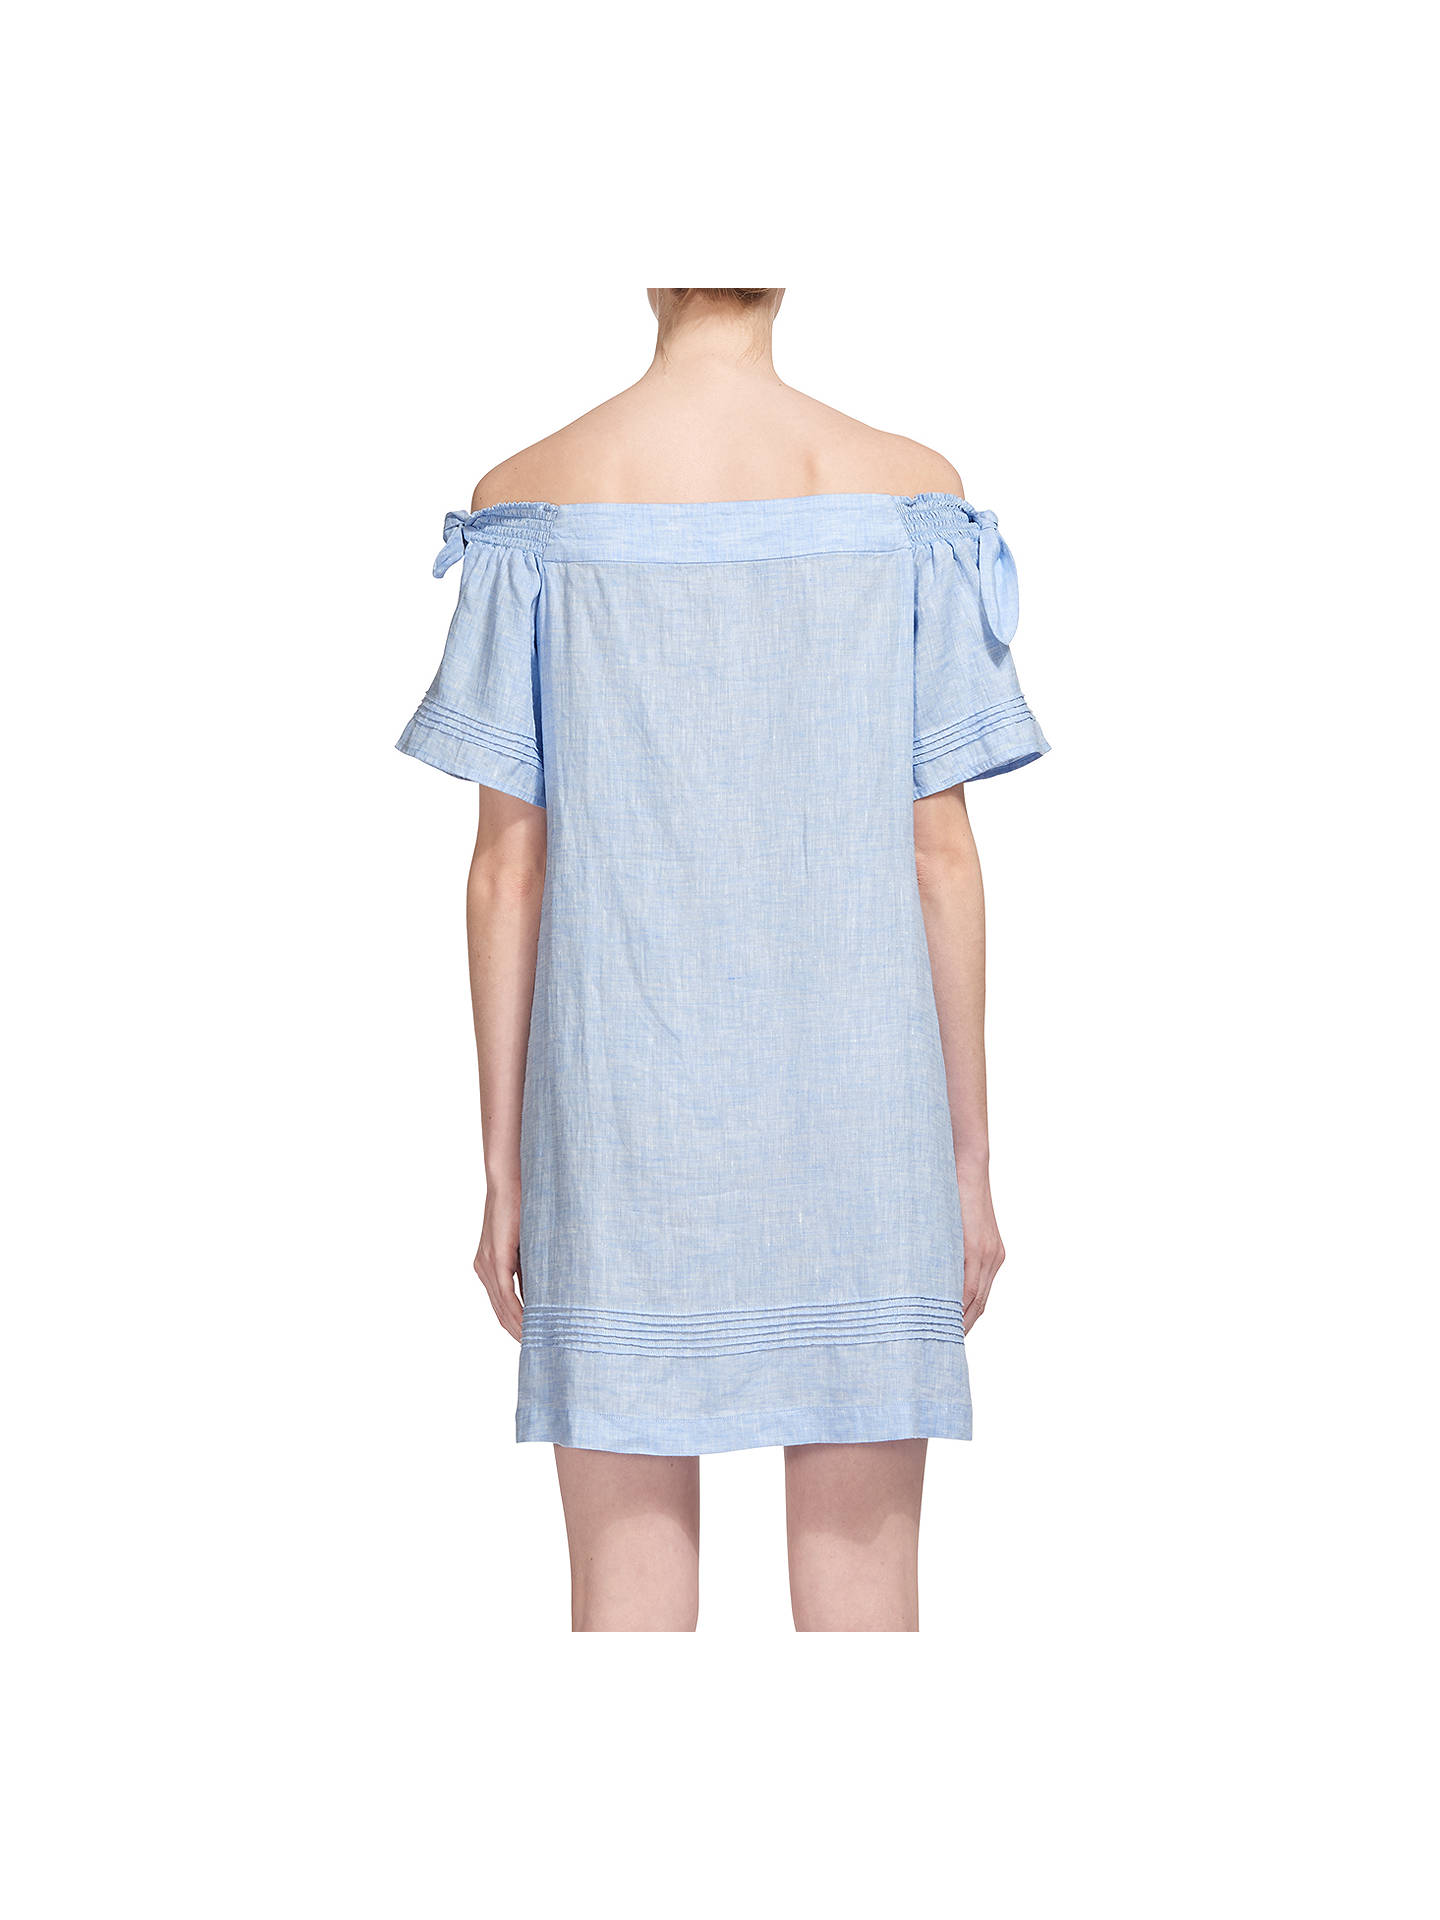 5a8a54707213b Whistles Lila Tie Linen Bardot Dress at John Lewis   Partners